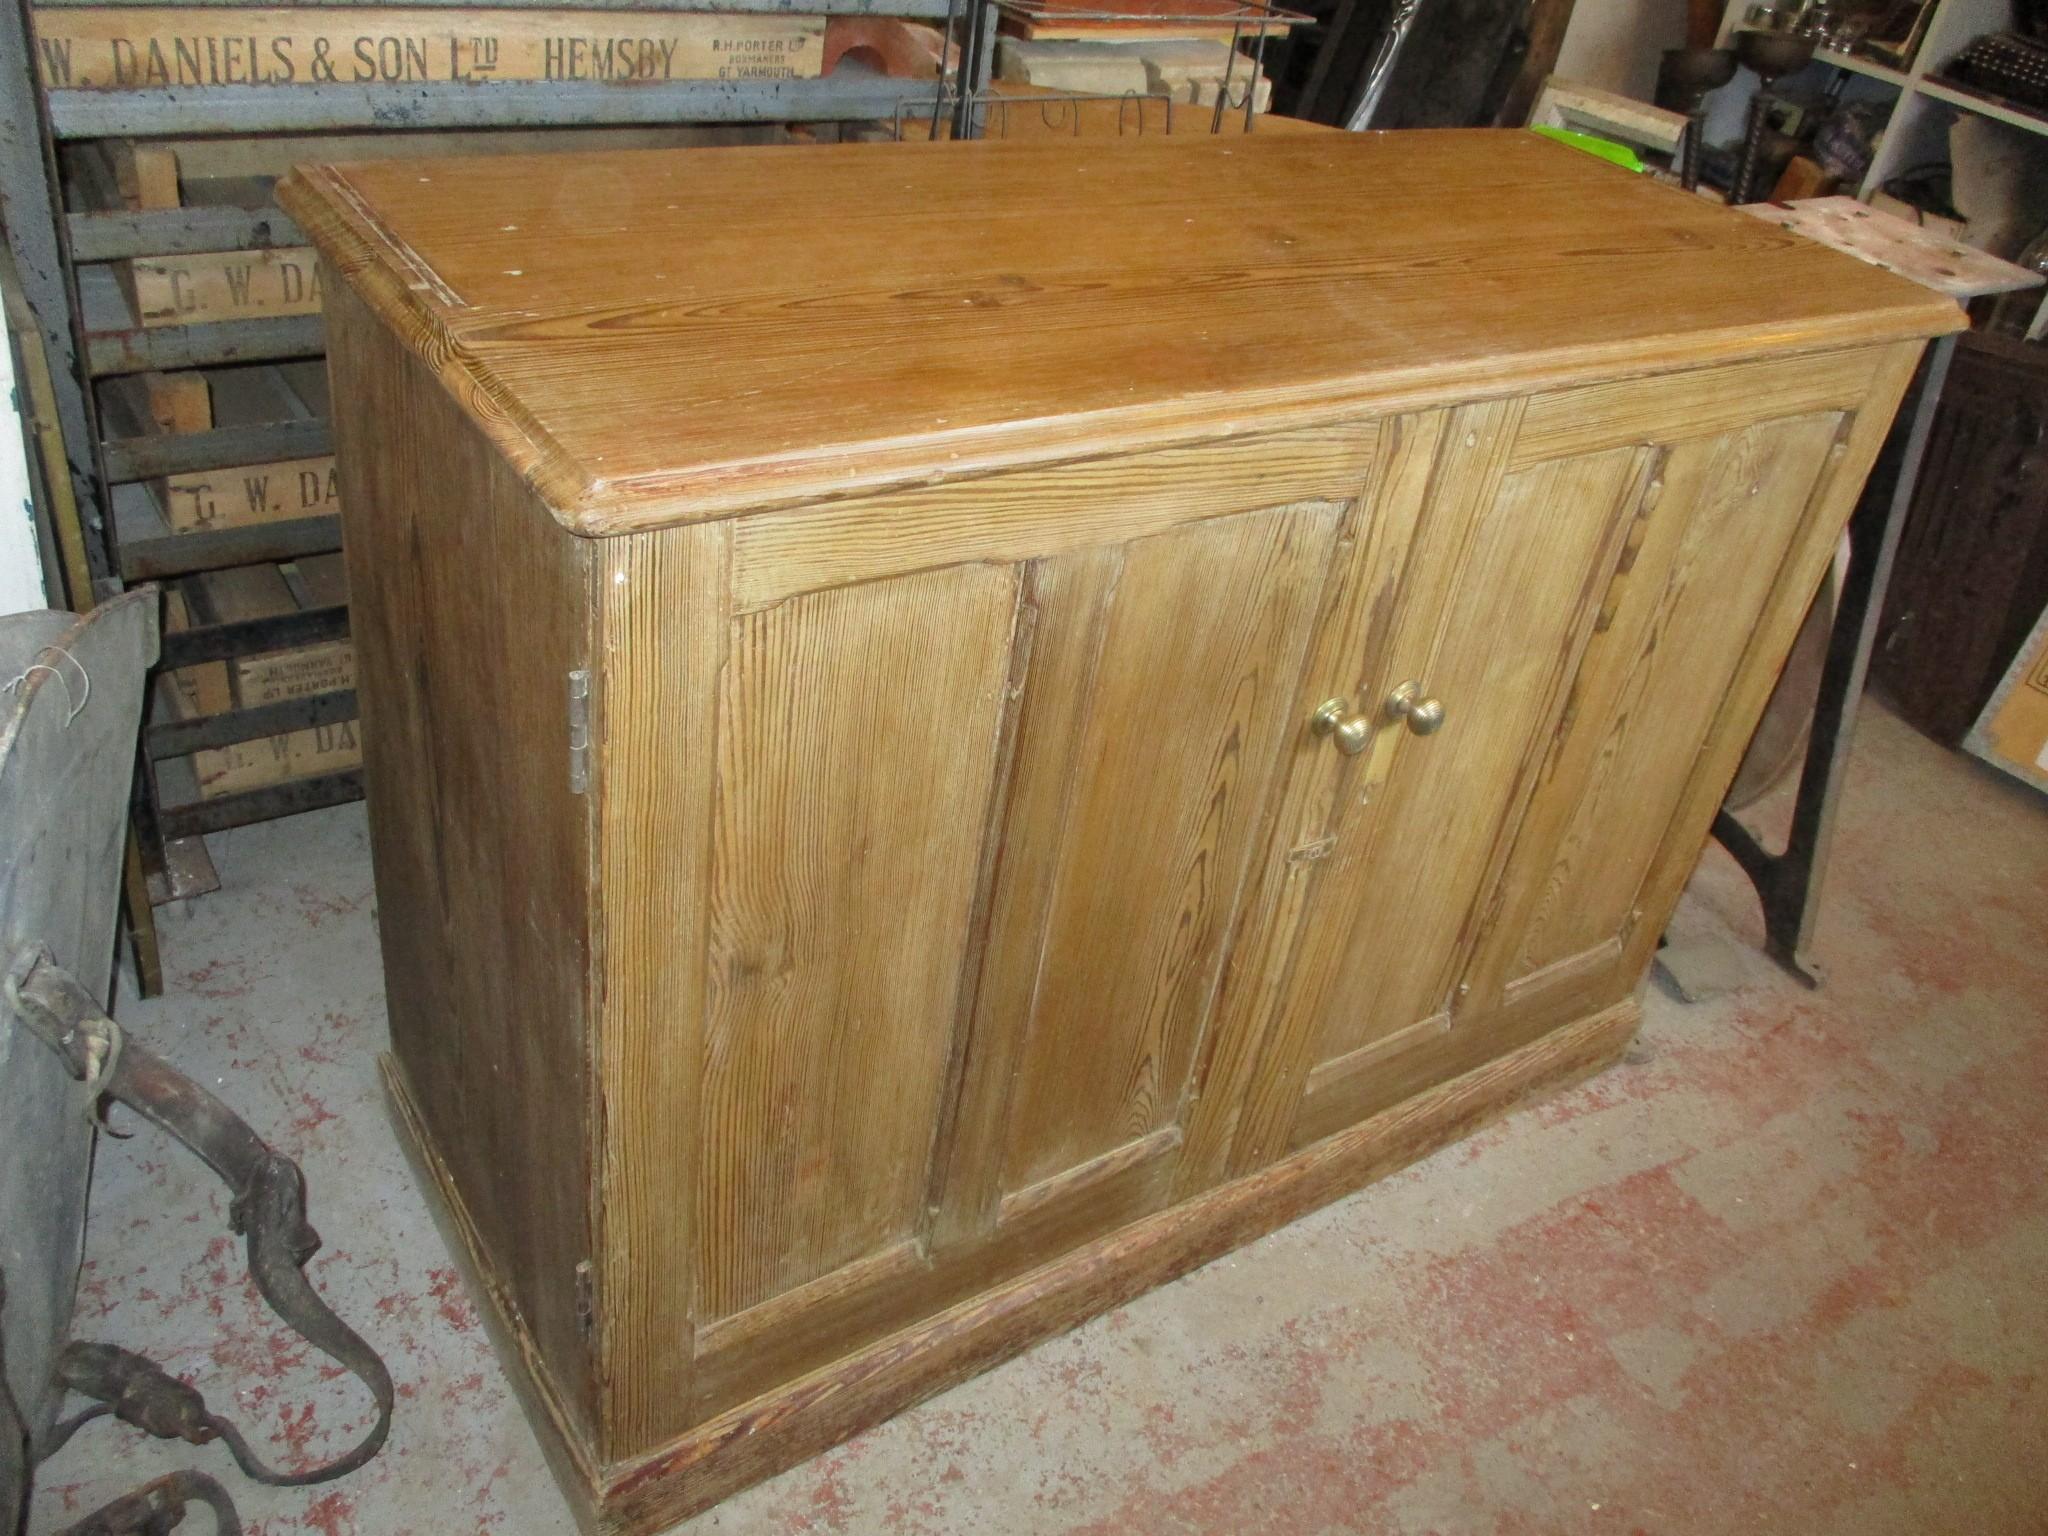 School pitch pine storage cupboard